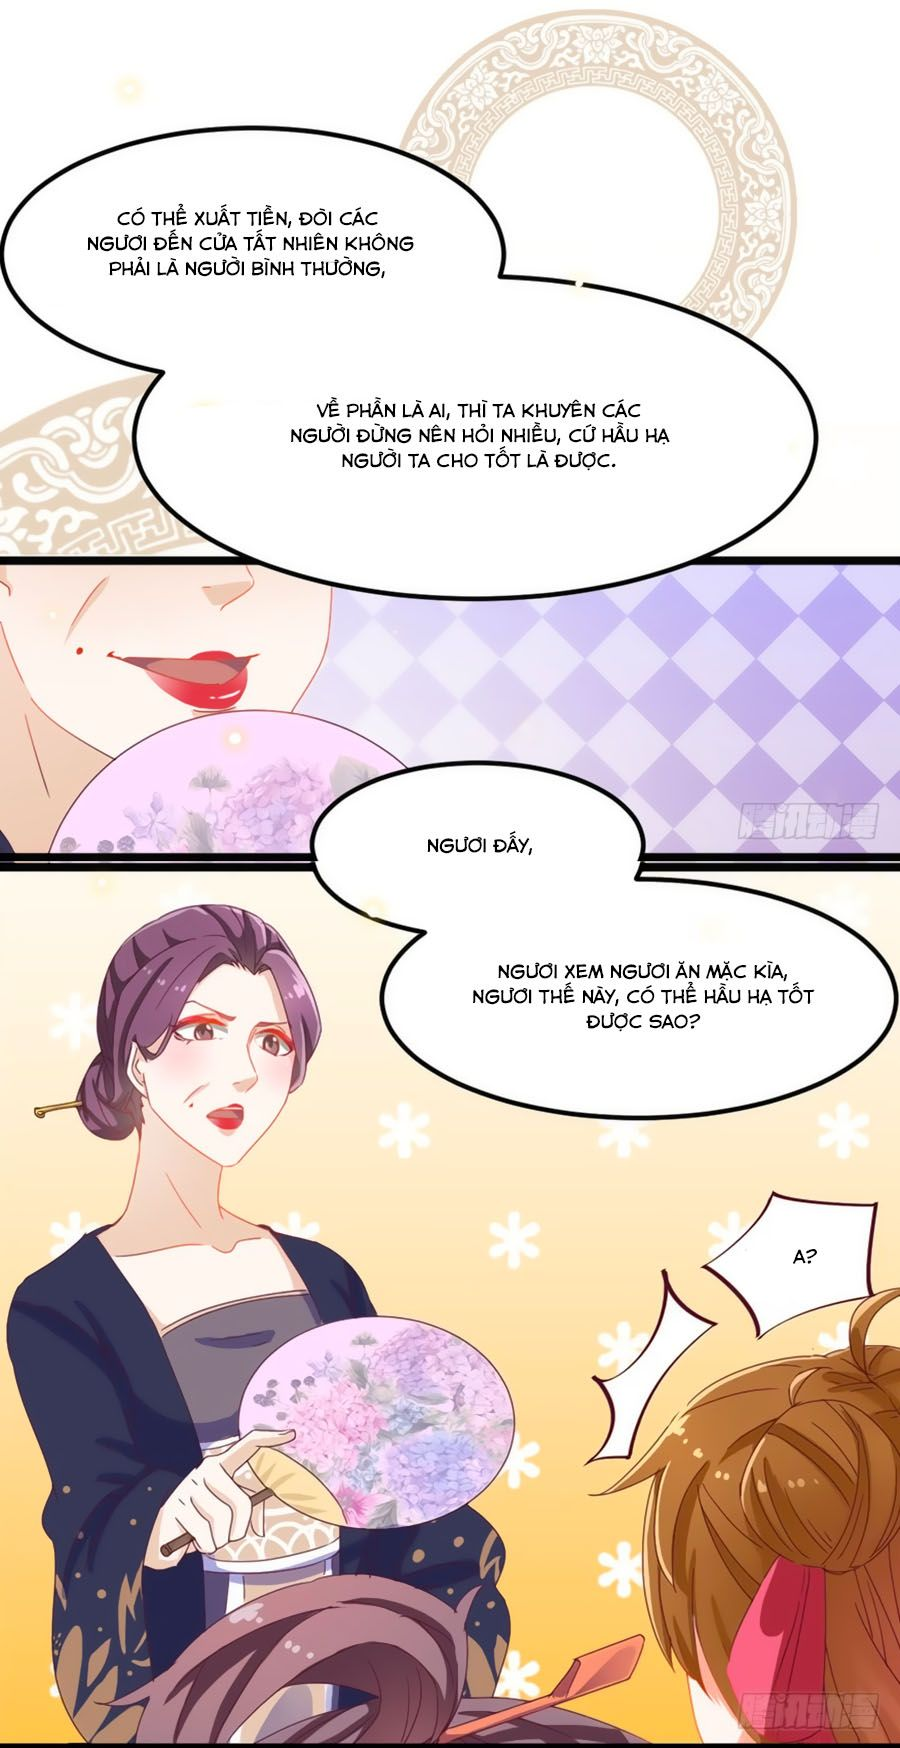 Ngọc Vi Mai chap 3 - Trang 12